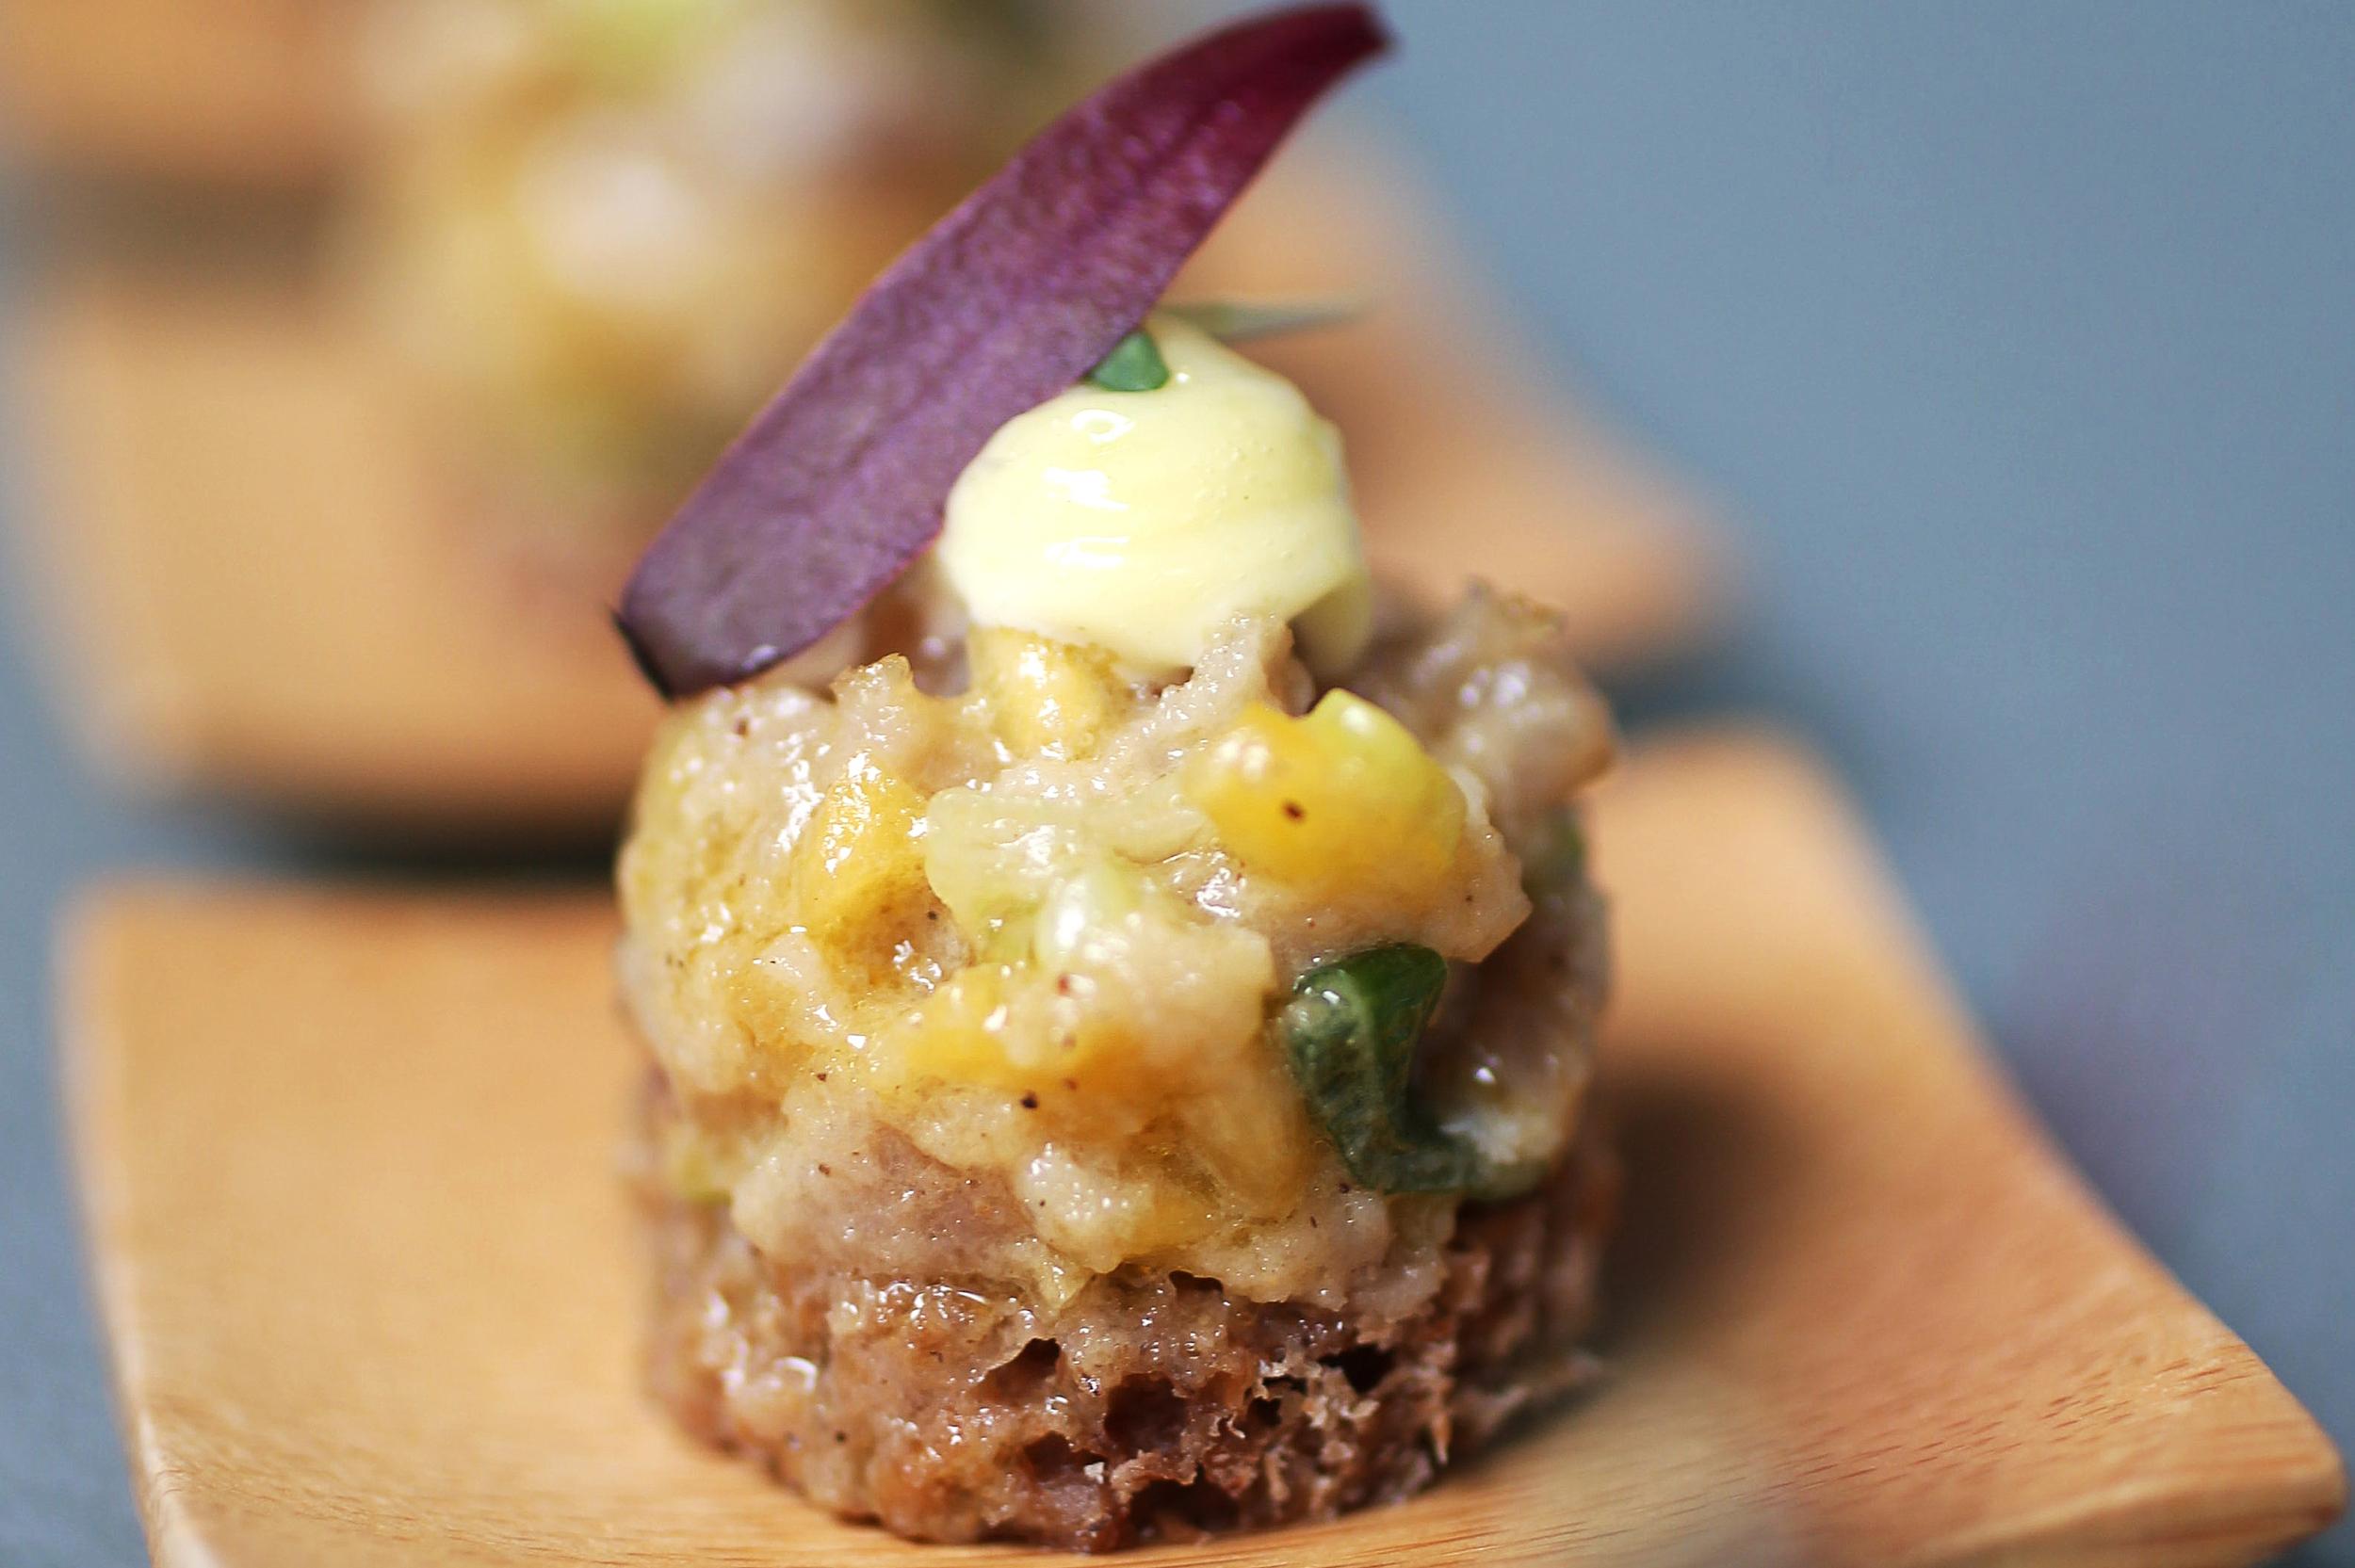 tuna tartar with spring onion, mango and wasabi mayonnaise served on pumpernickel bread web.jpg